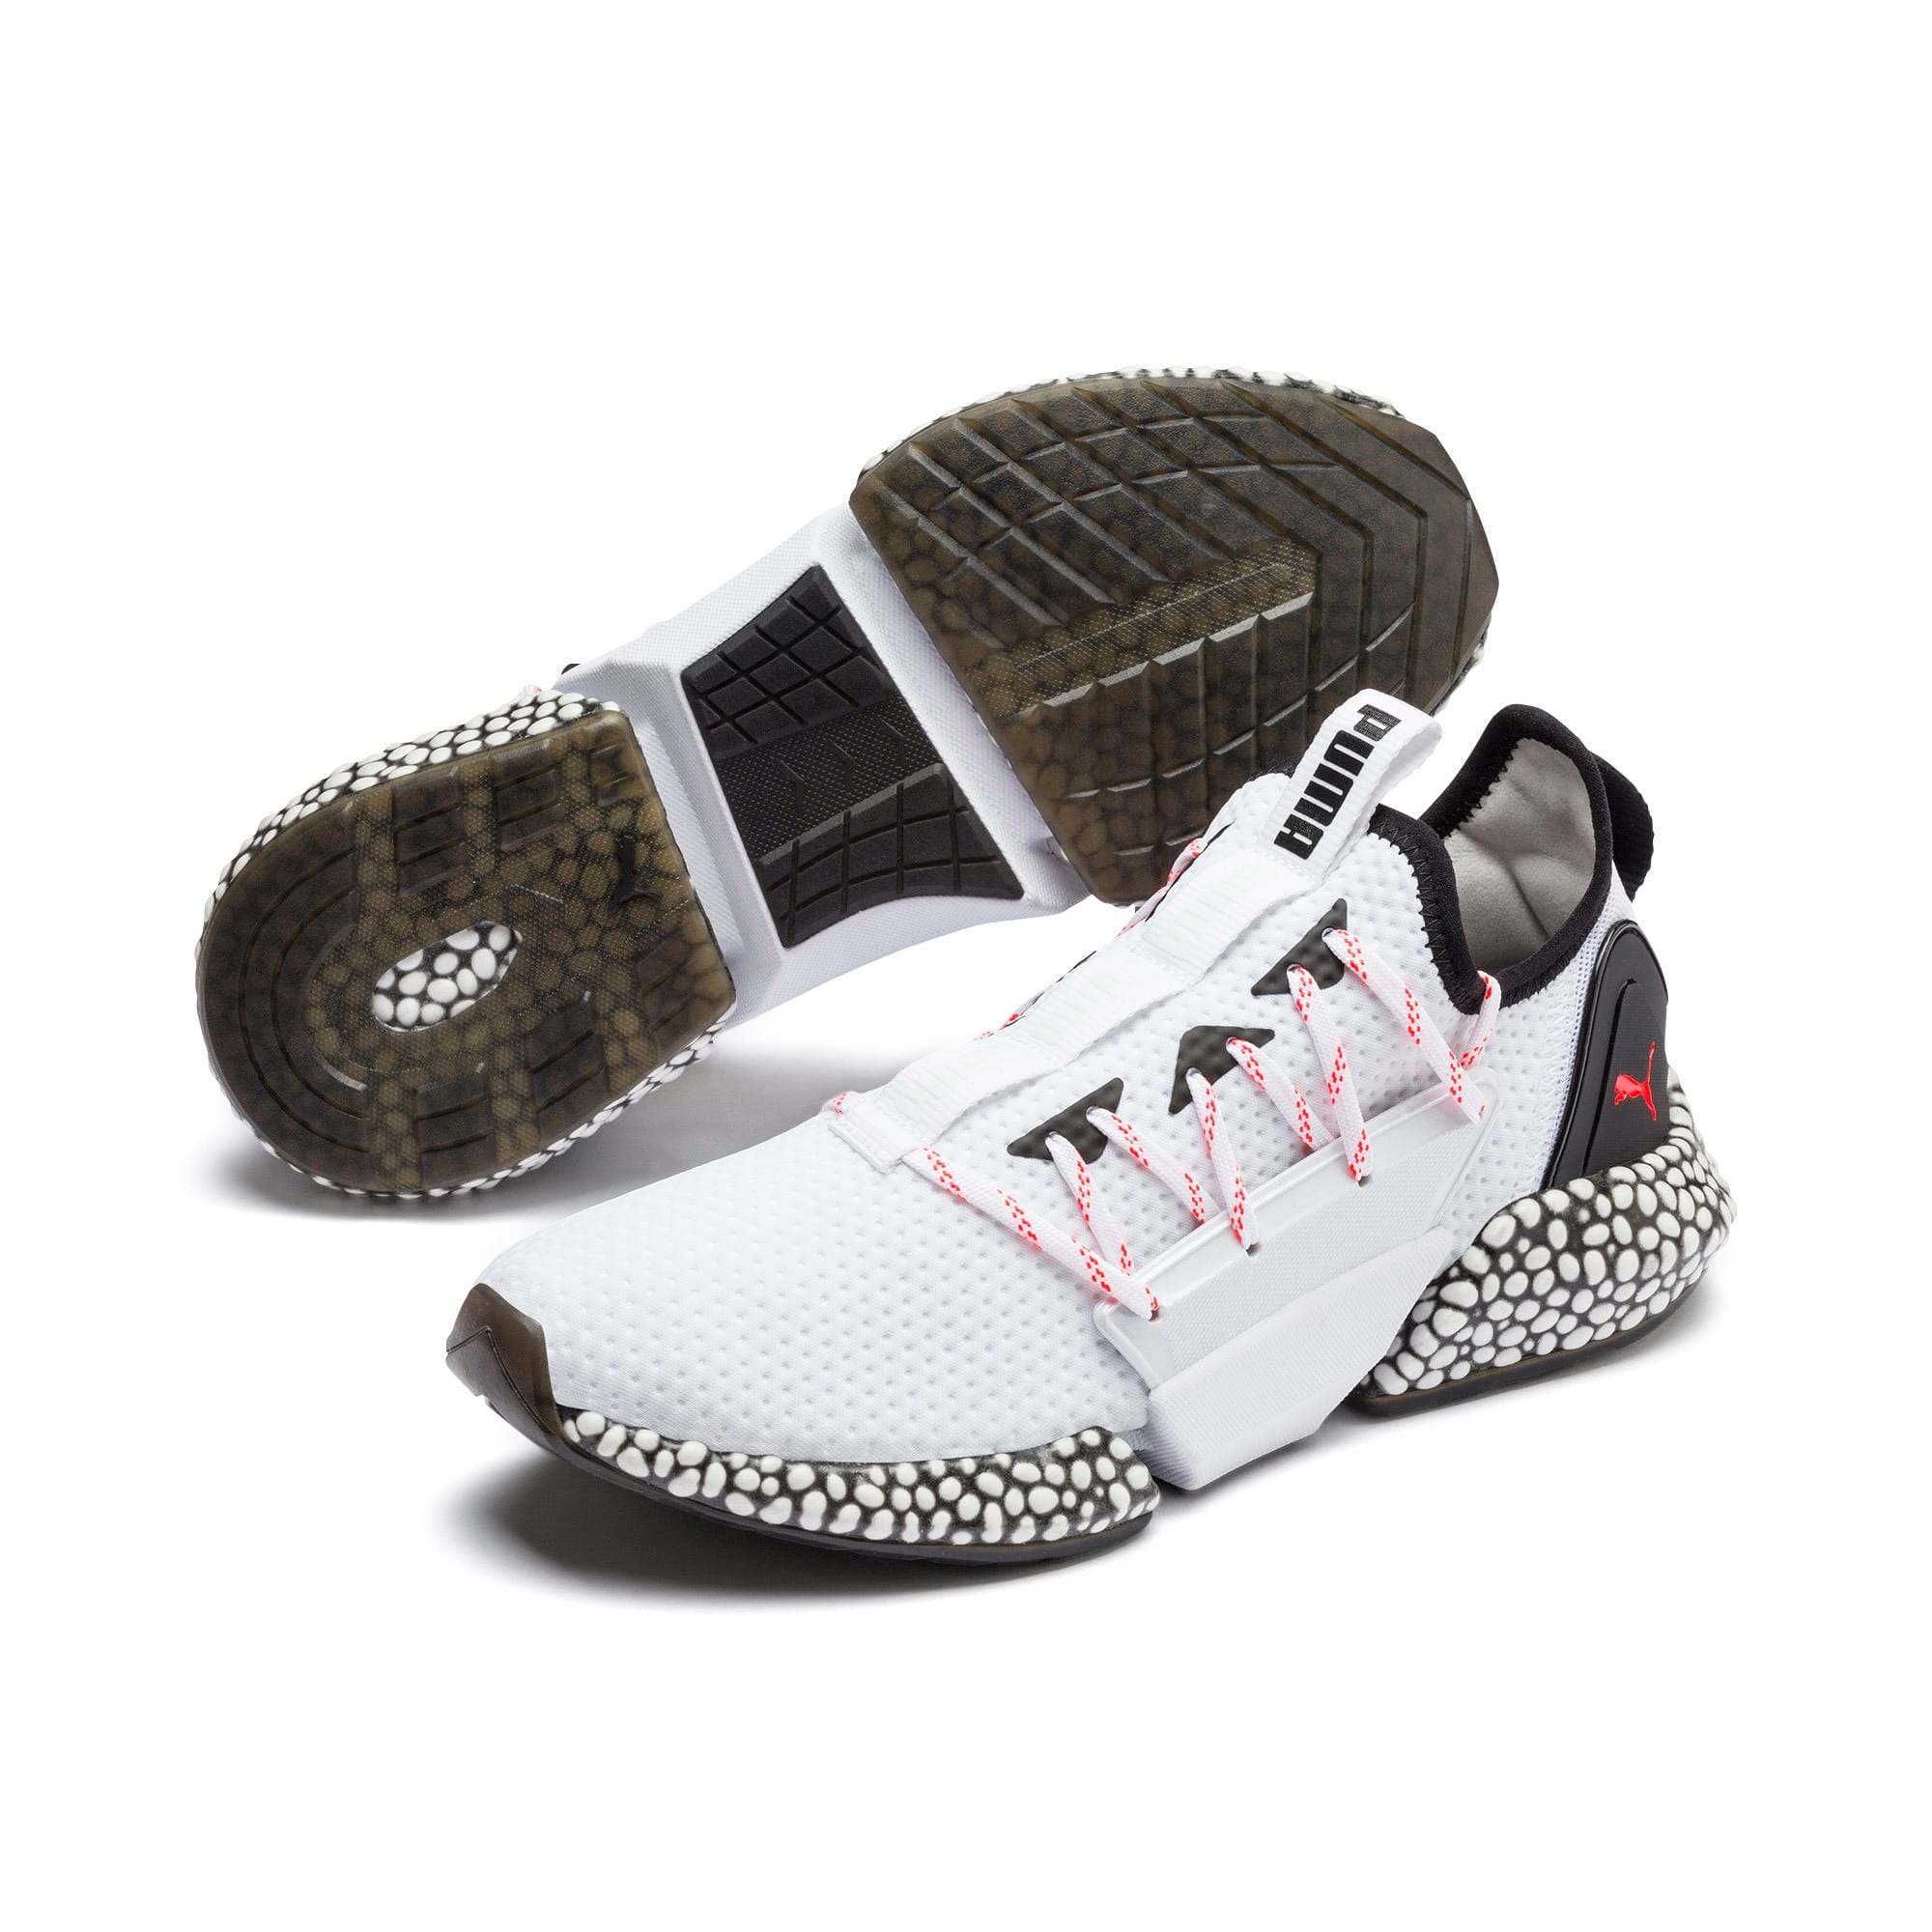 Thumbnail 3 of HYBRID Rocket Aero Men's Running Shoes, Puma White-Puma Black, medium